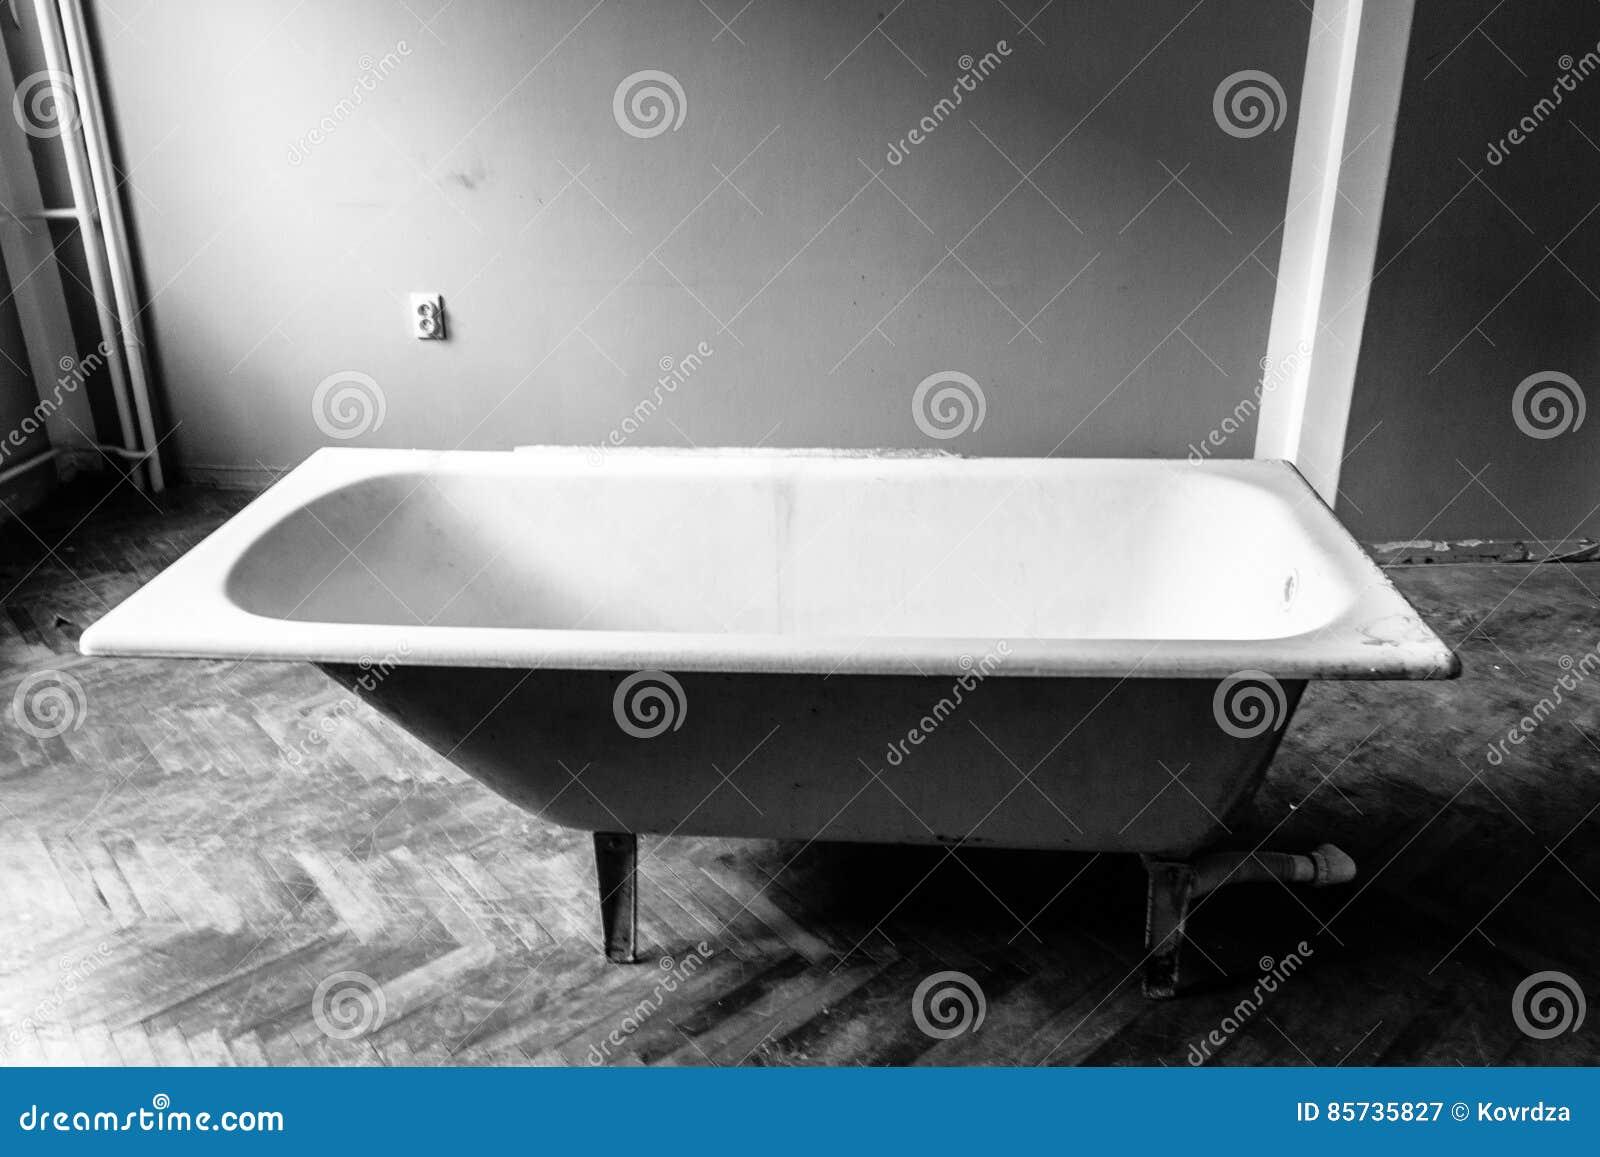 Old Bath Tube, Black And White Stock Image - Image of border, focus ...